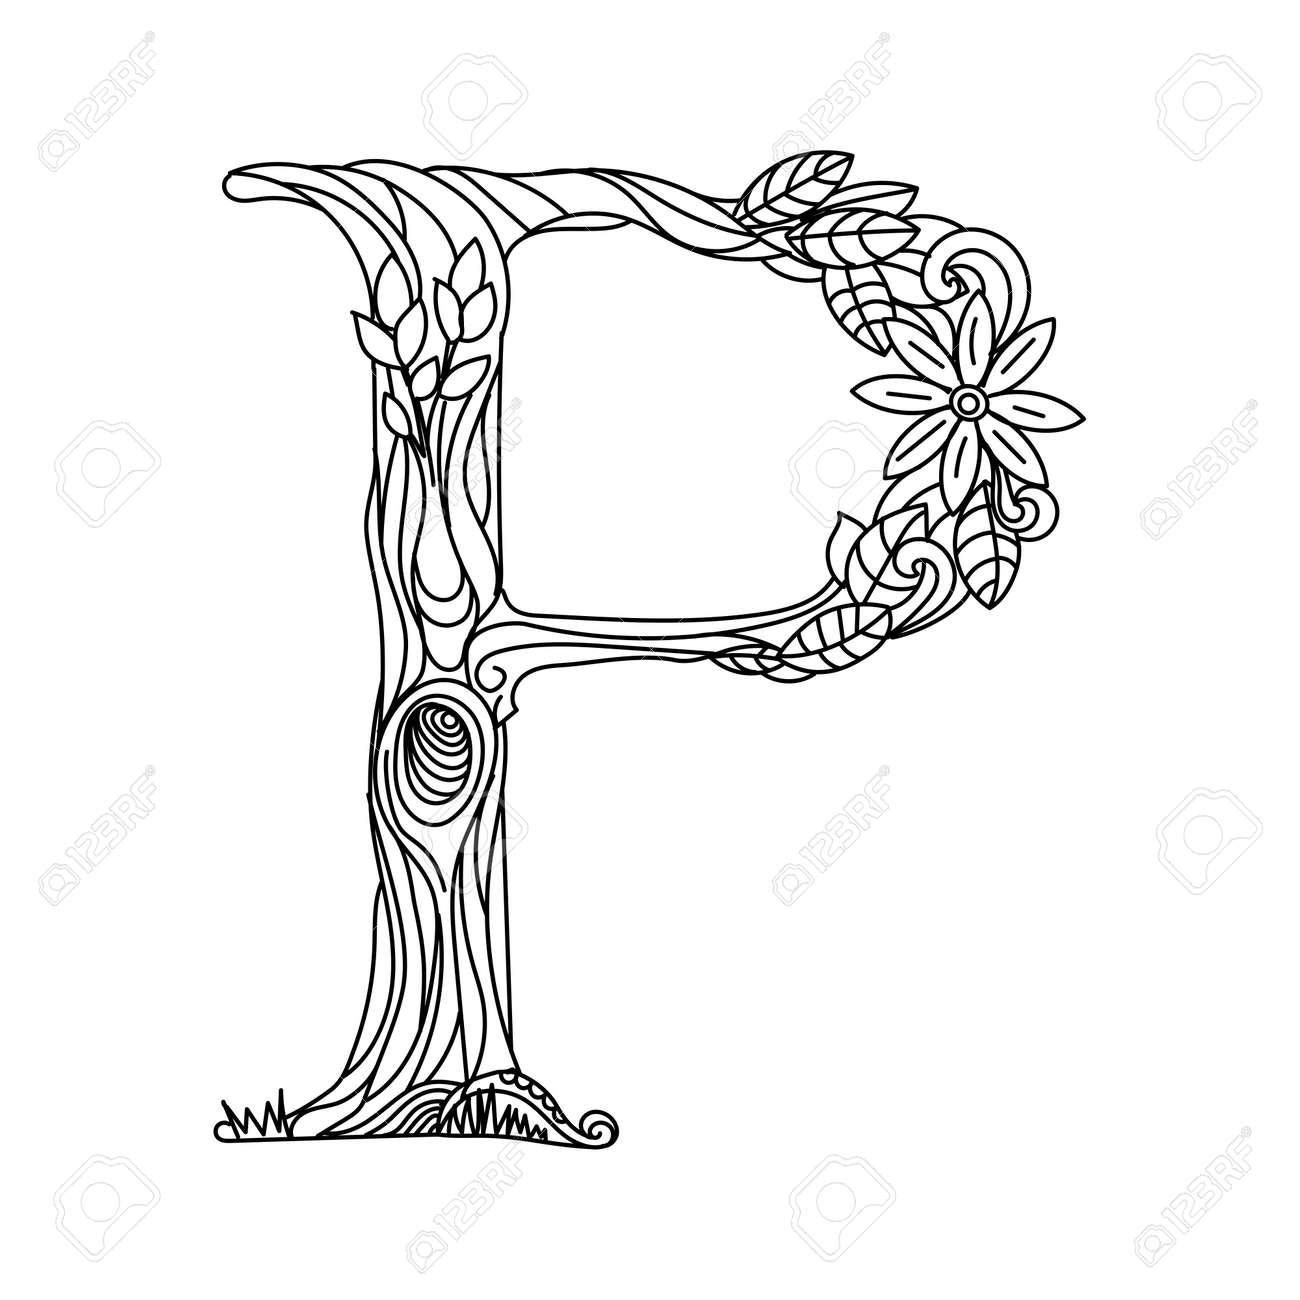 Floral alphabet letter coloring book for adults illustration.